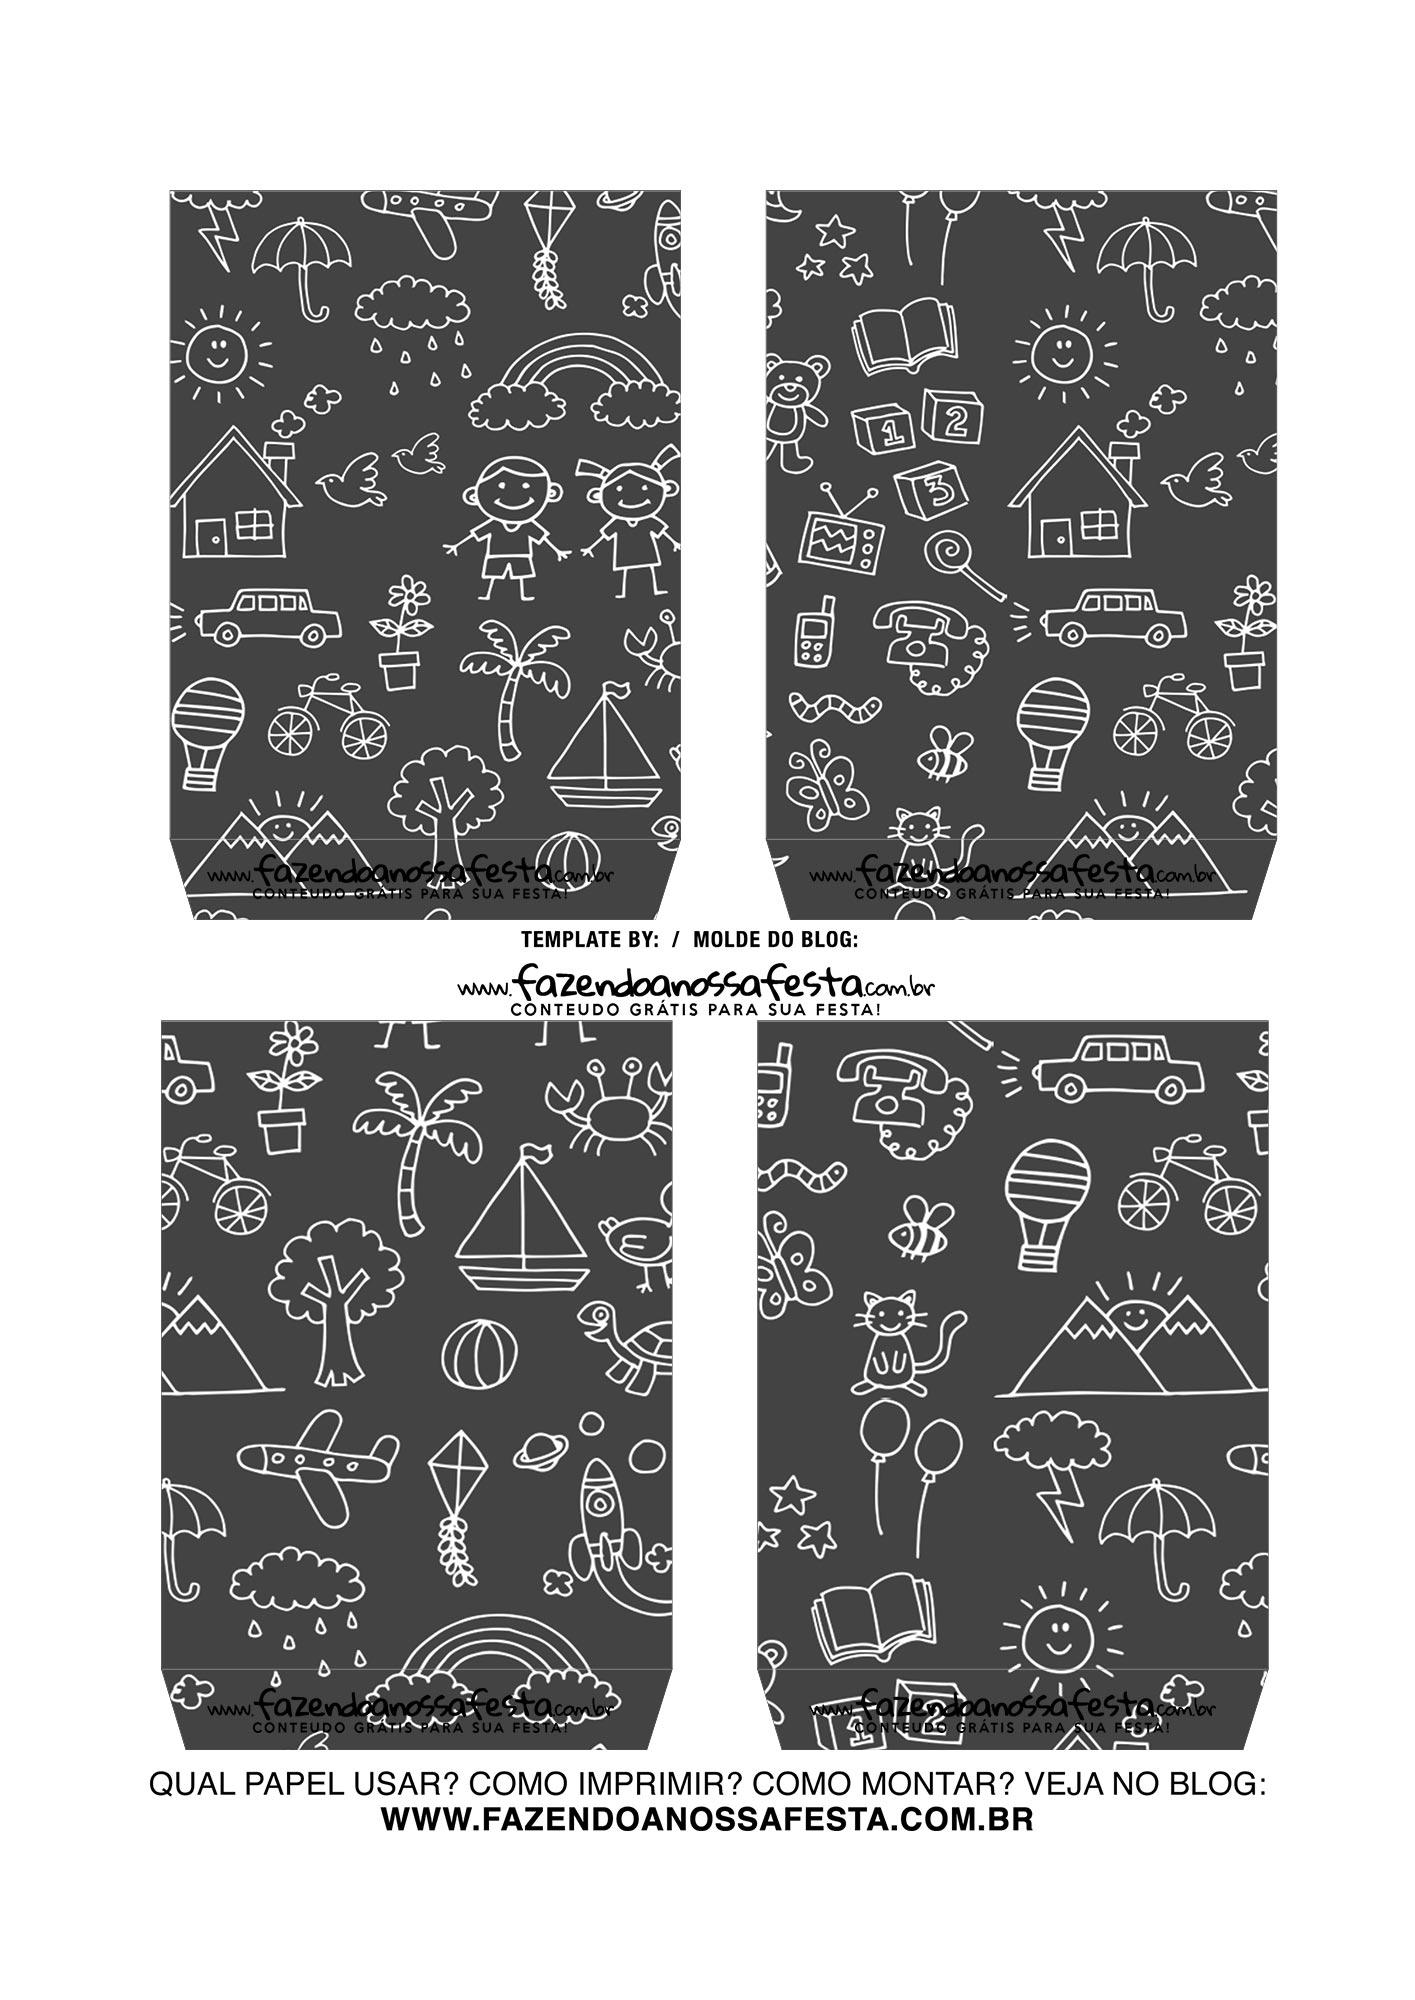 Caixa Explosiva Dia das Criancas Chalkboard 4